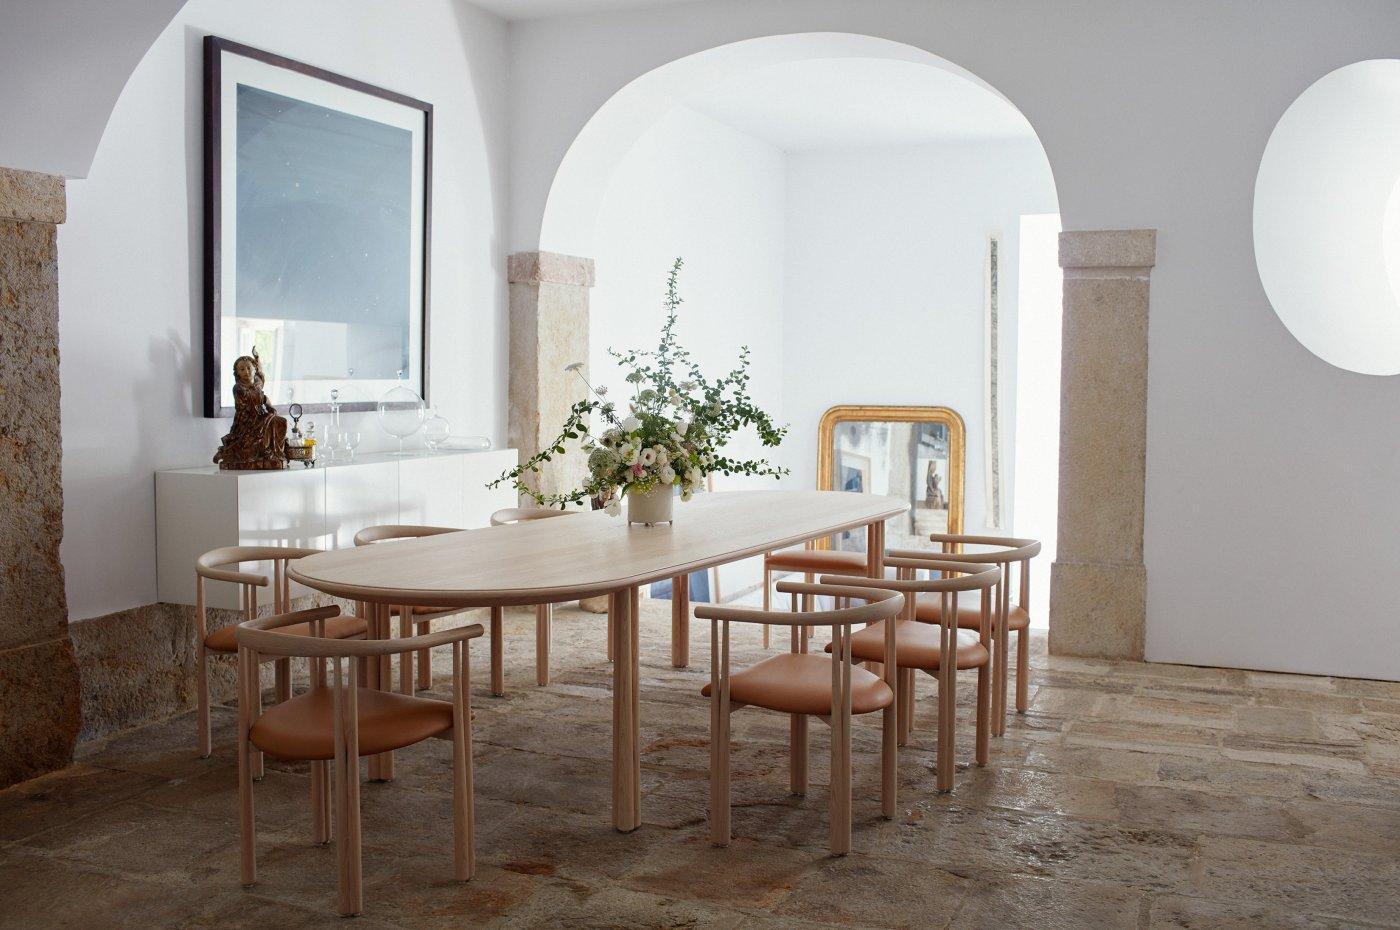 DLE_Elliot_Table_and_Chair_01_Photo_by_Yuki_Sugiura_WEB_lightbox_photo_photo.jpg